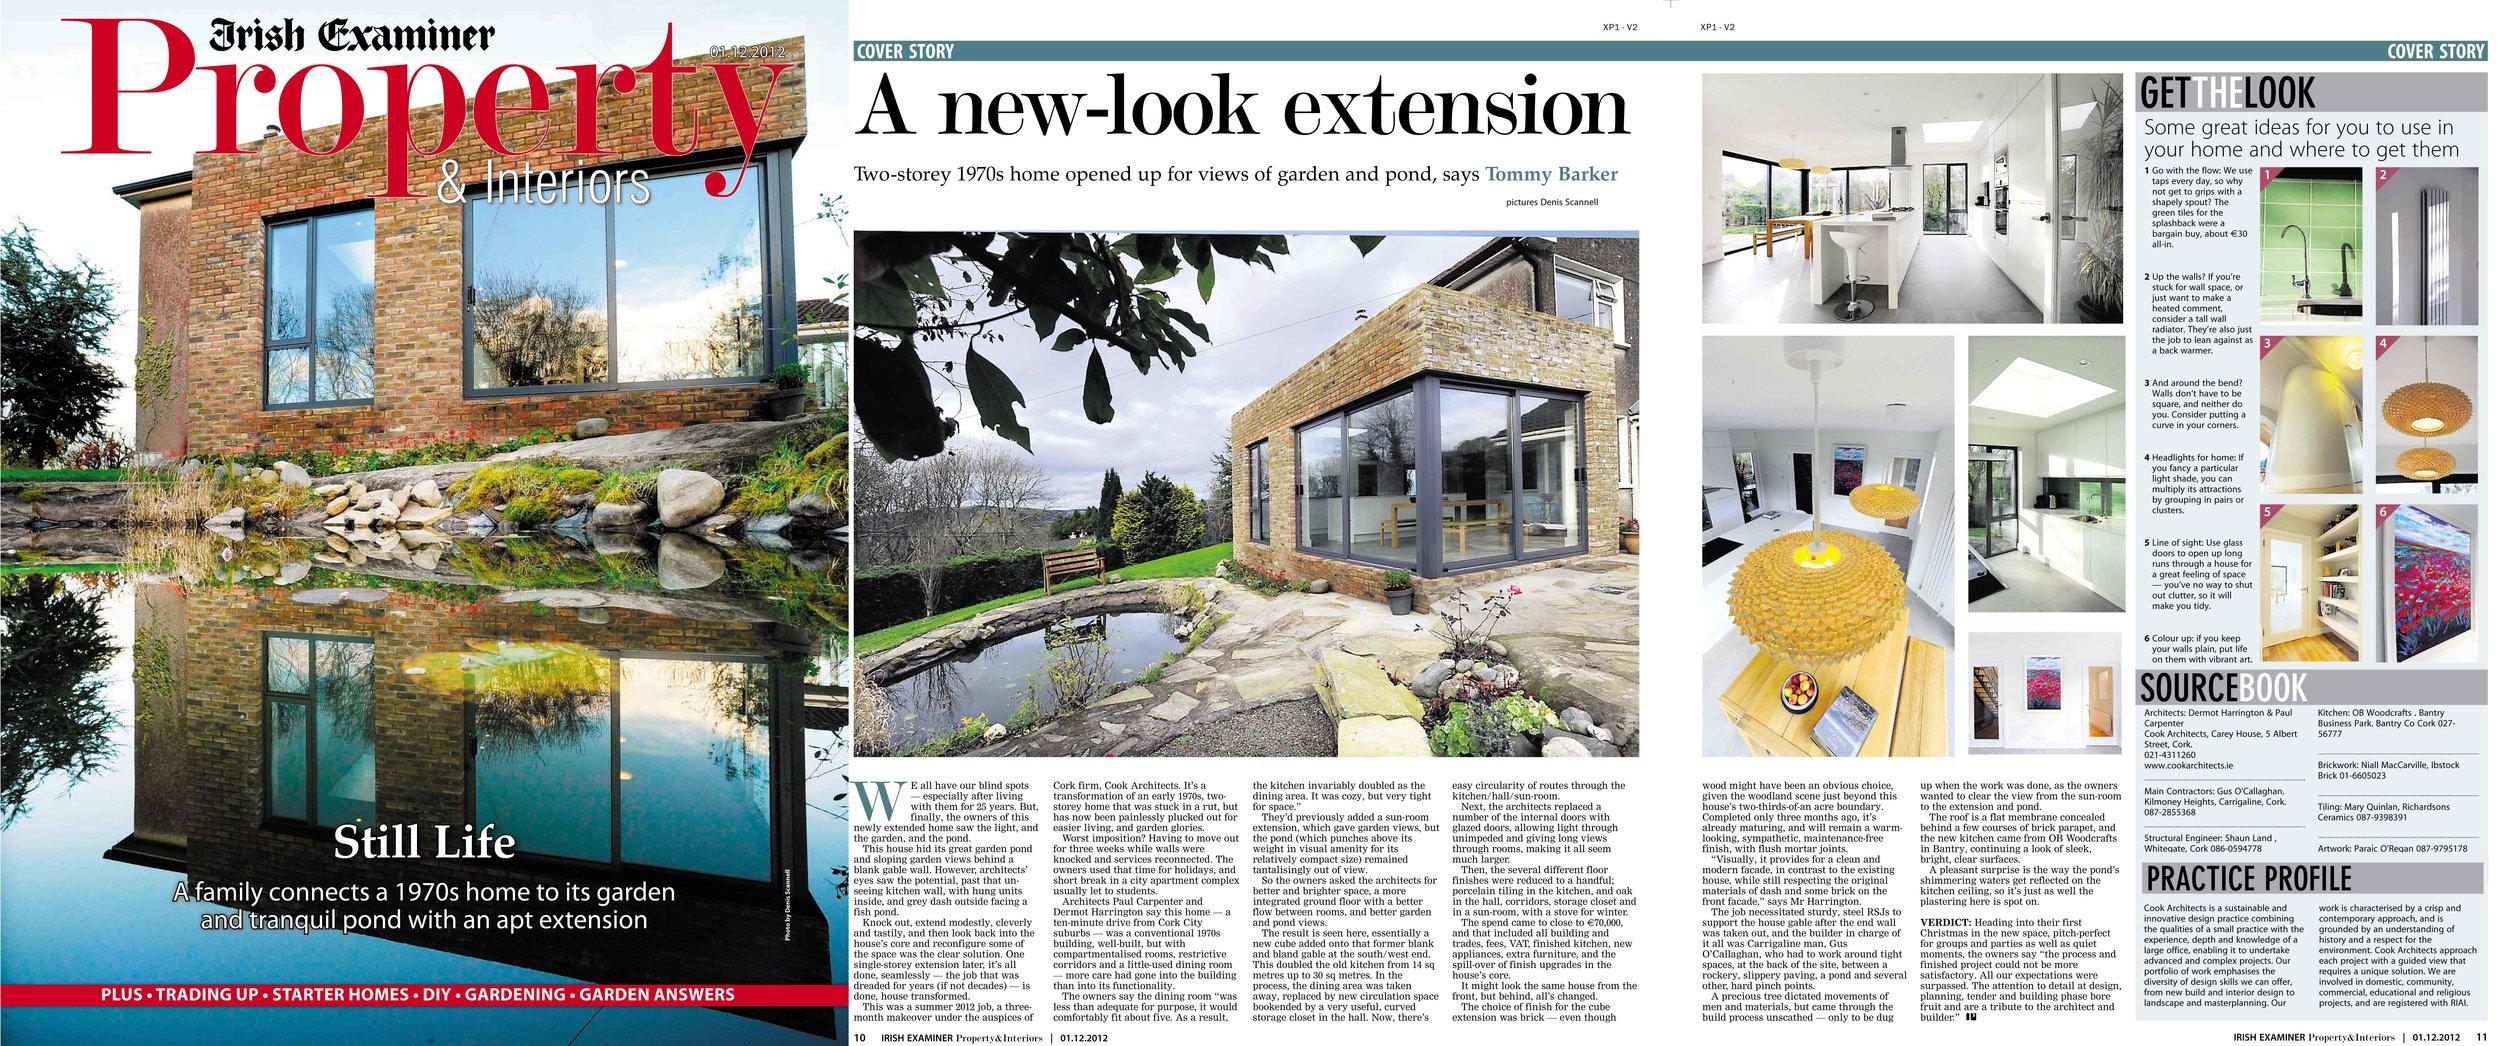 Irish Examiner 01.12.2012 - Irish Examiner - Property supplement December 2012